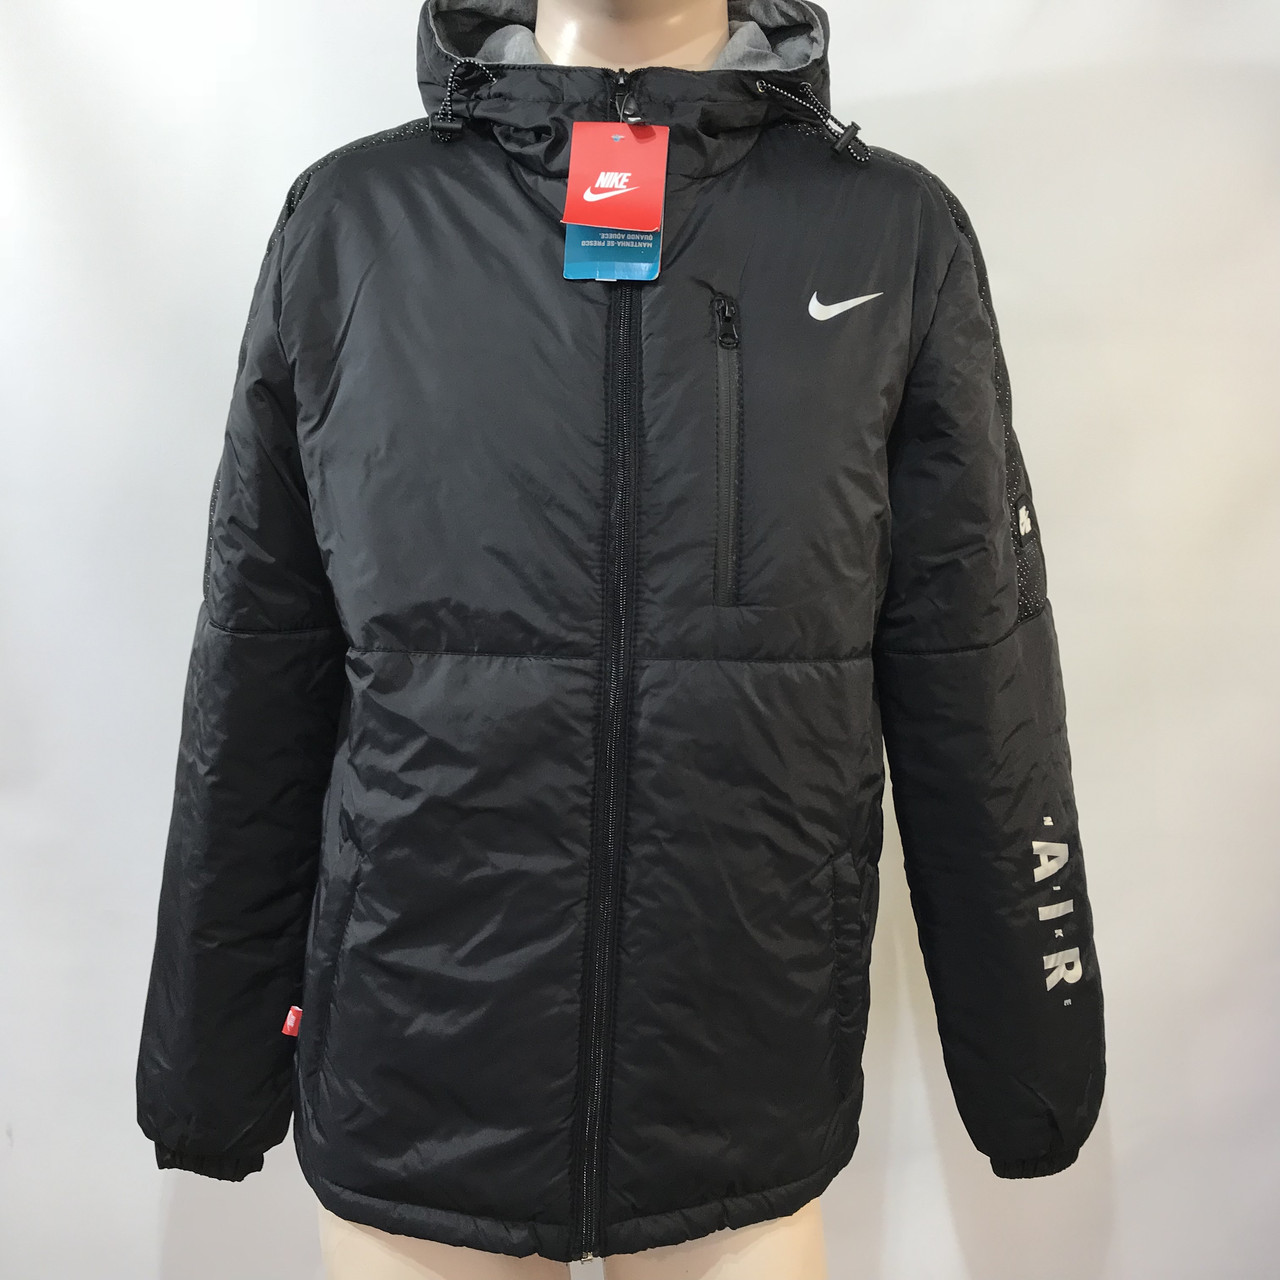 e9e16ec7 Ветровка мужская Nike / черная : продажа, цена в Запорожье. куртки ...